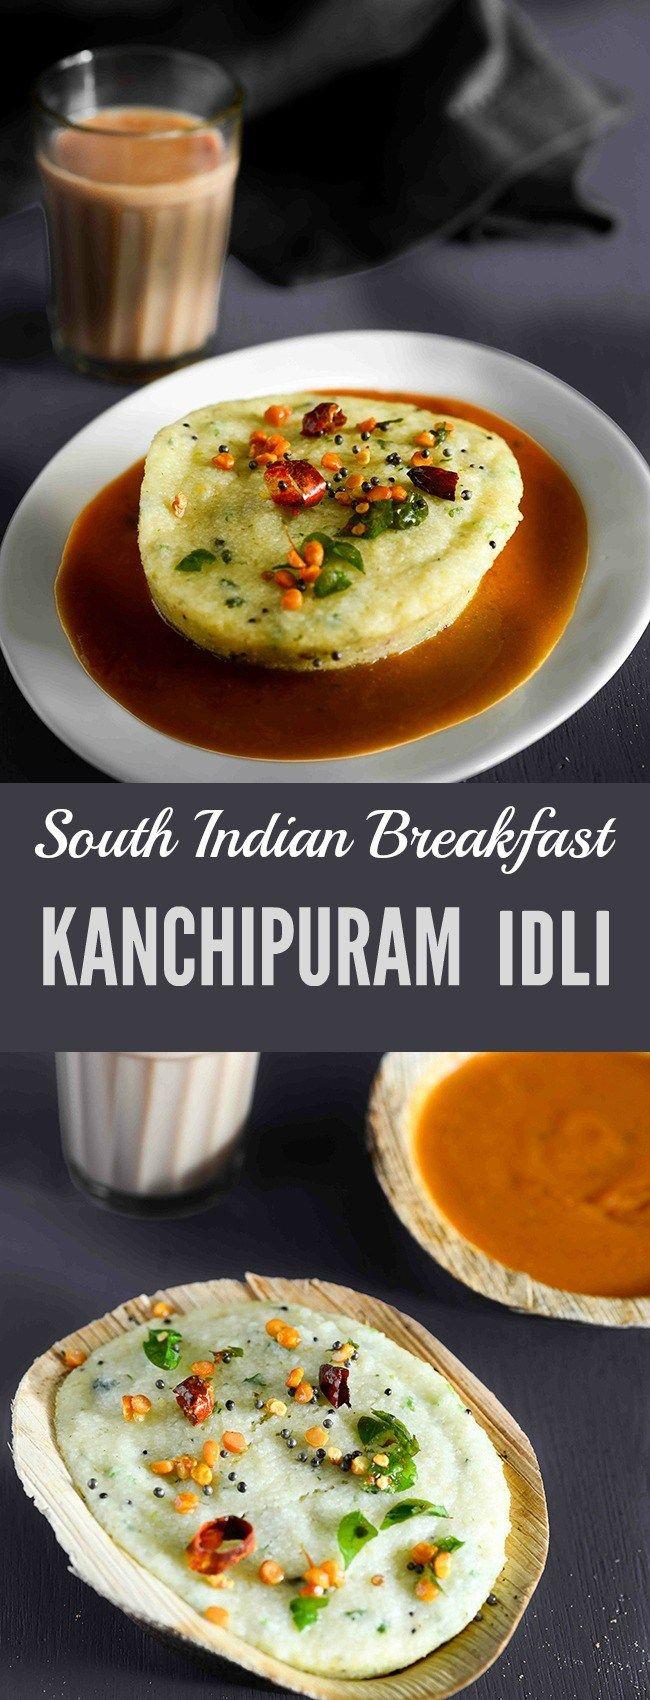 Kanchipuram Idli Recipe | Idli Varieties of India